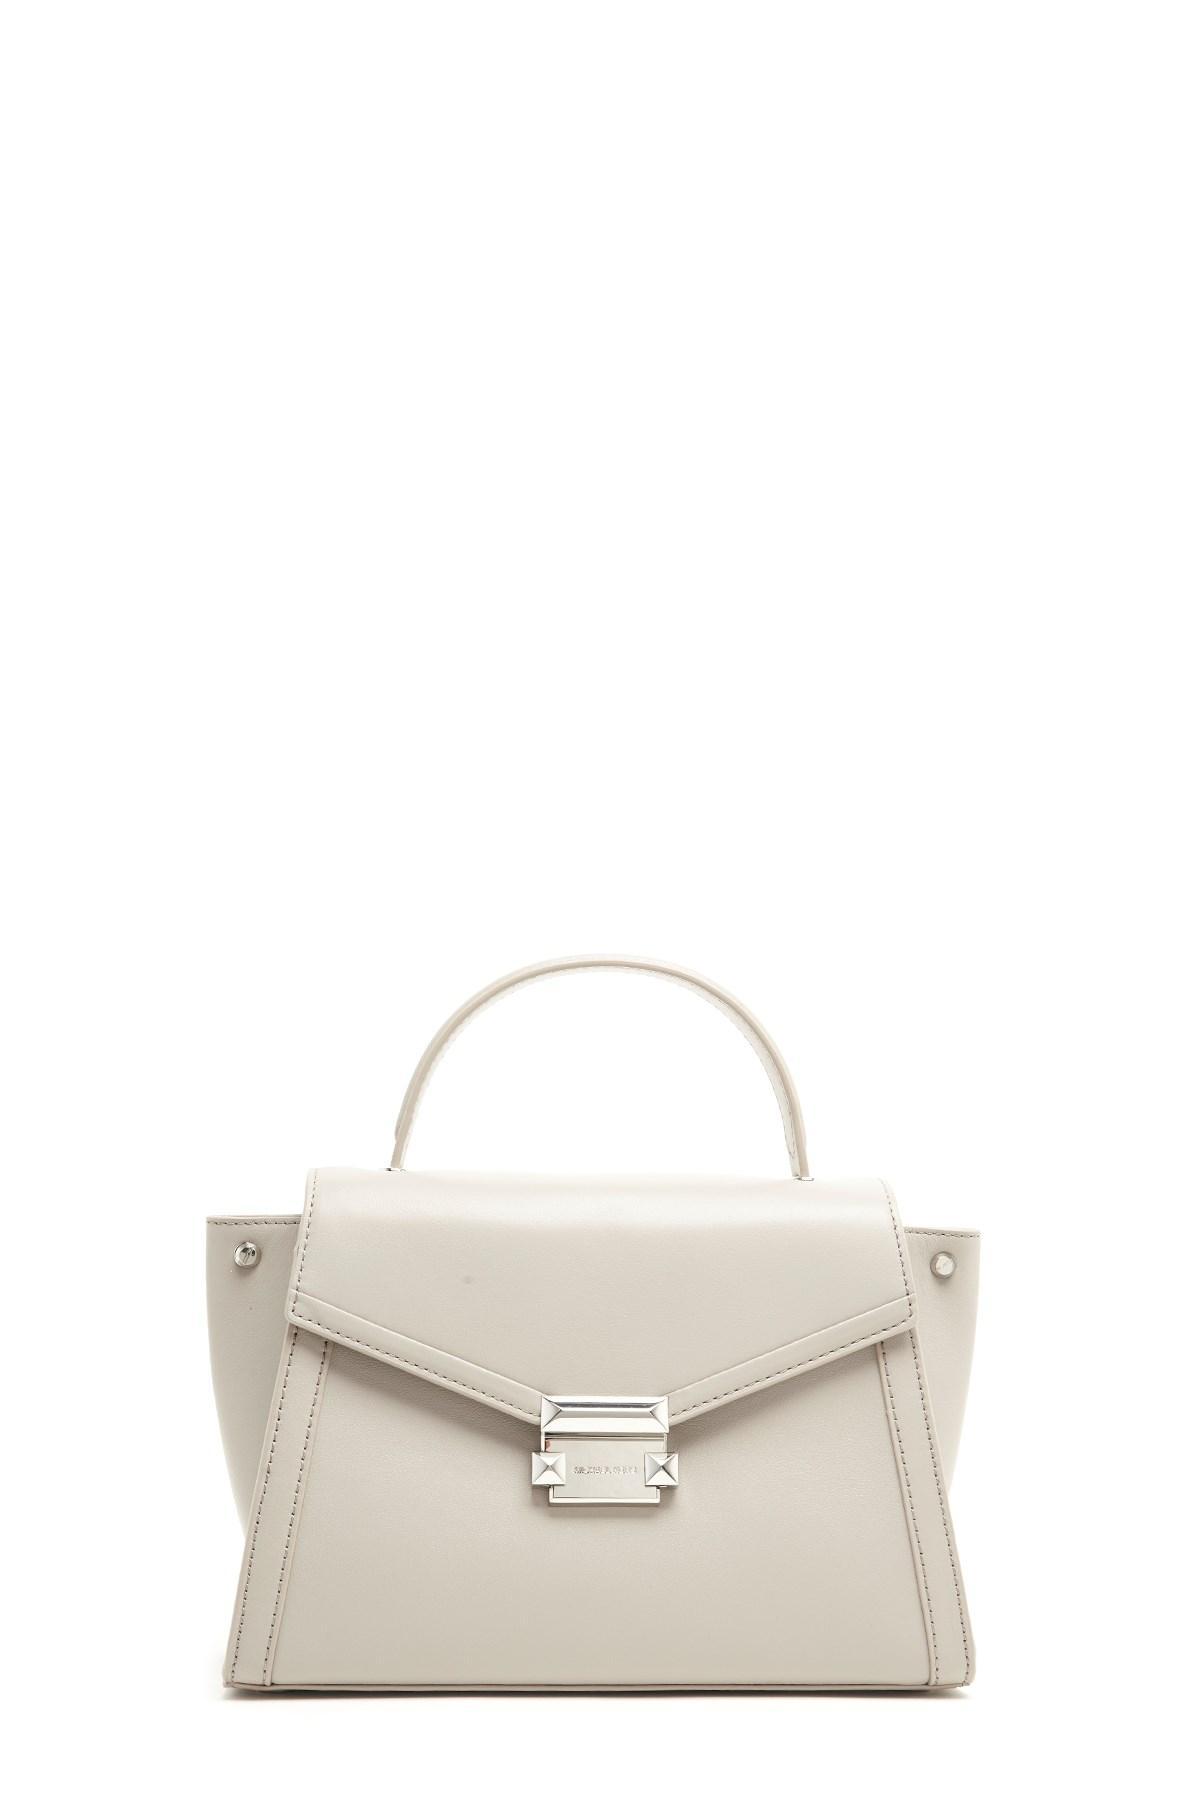 a213850d6e0f Lyst - MICHAEL Michael Kors 'whitney' Hand Bag in Gray